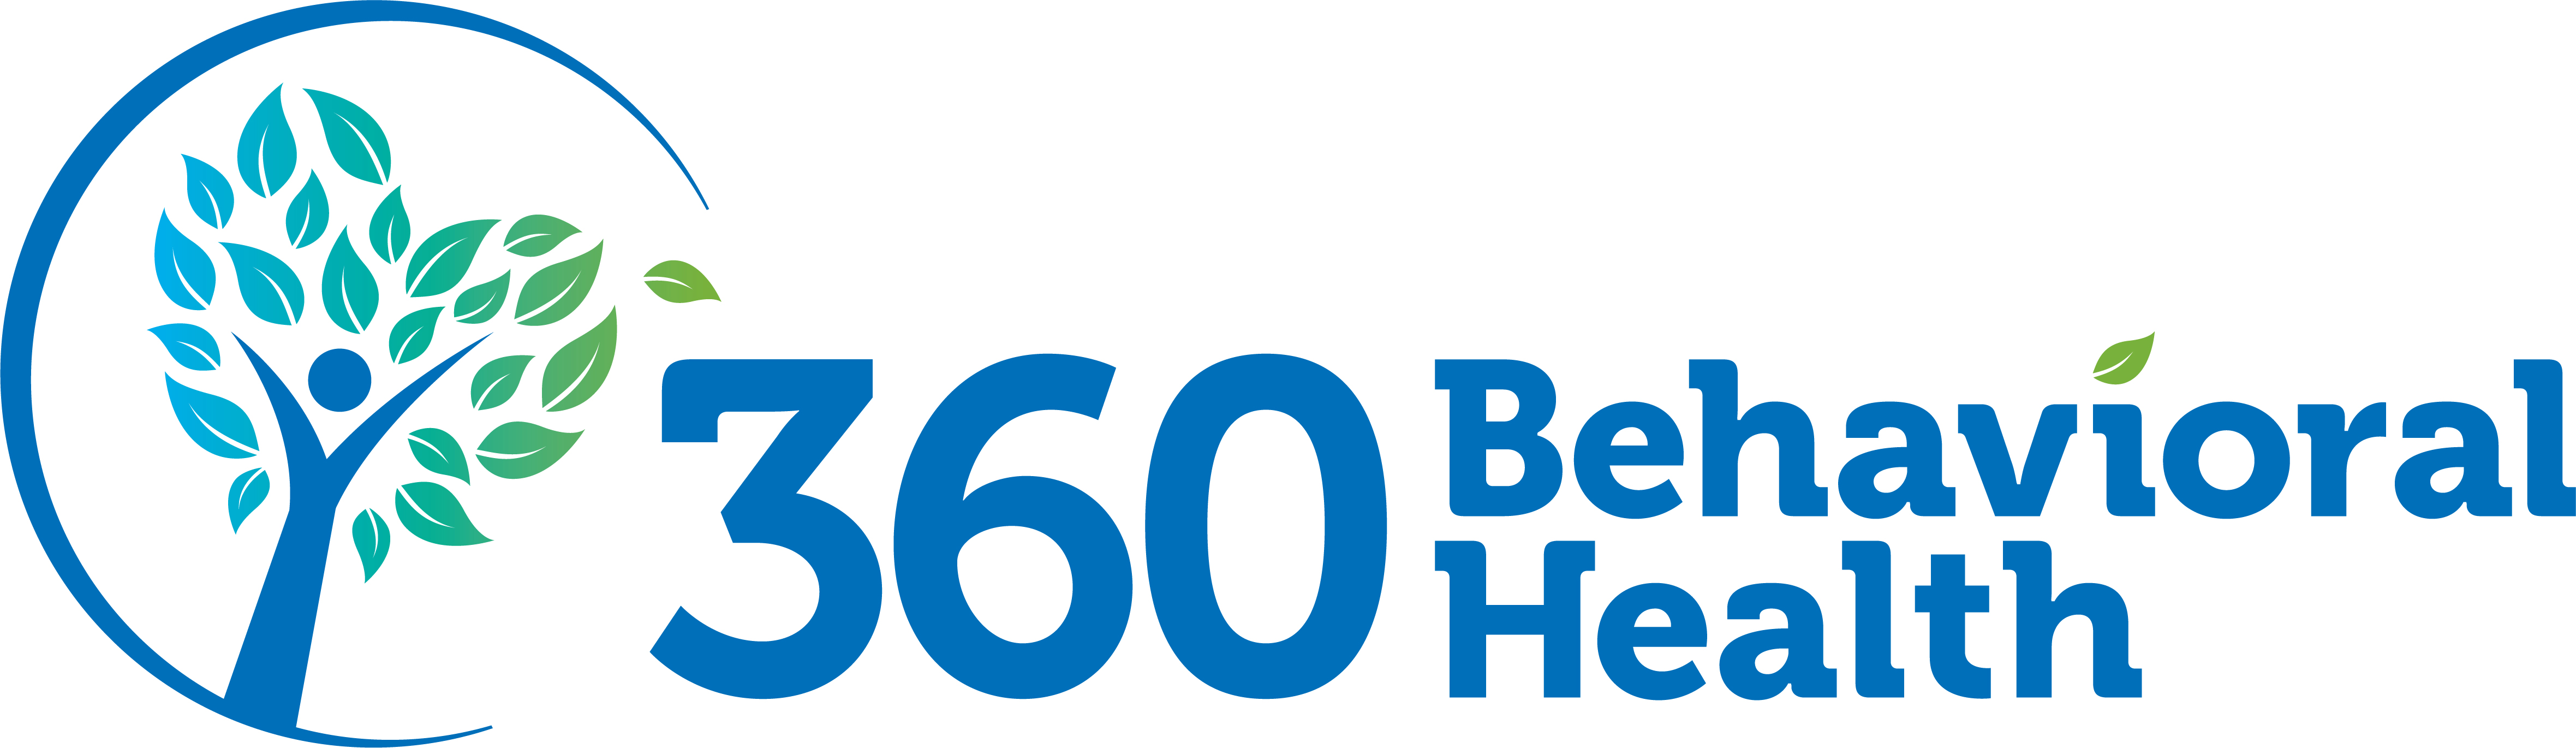 SILVER 360 Behavioral Health